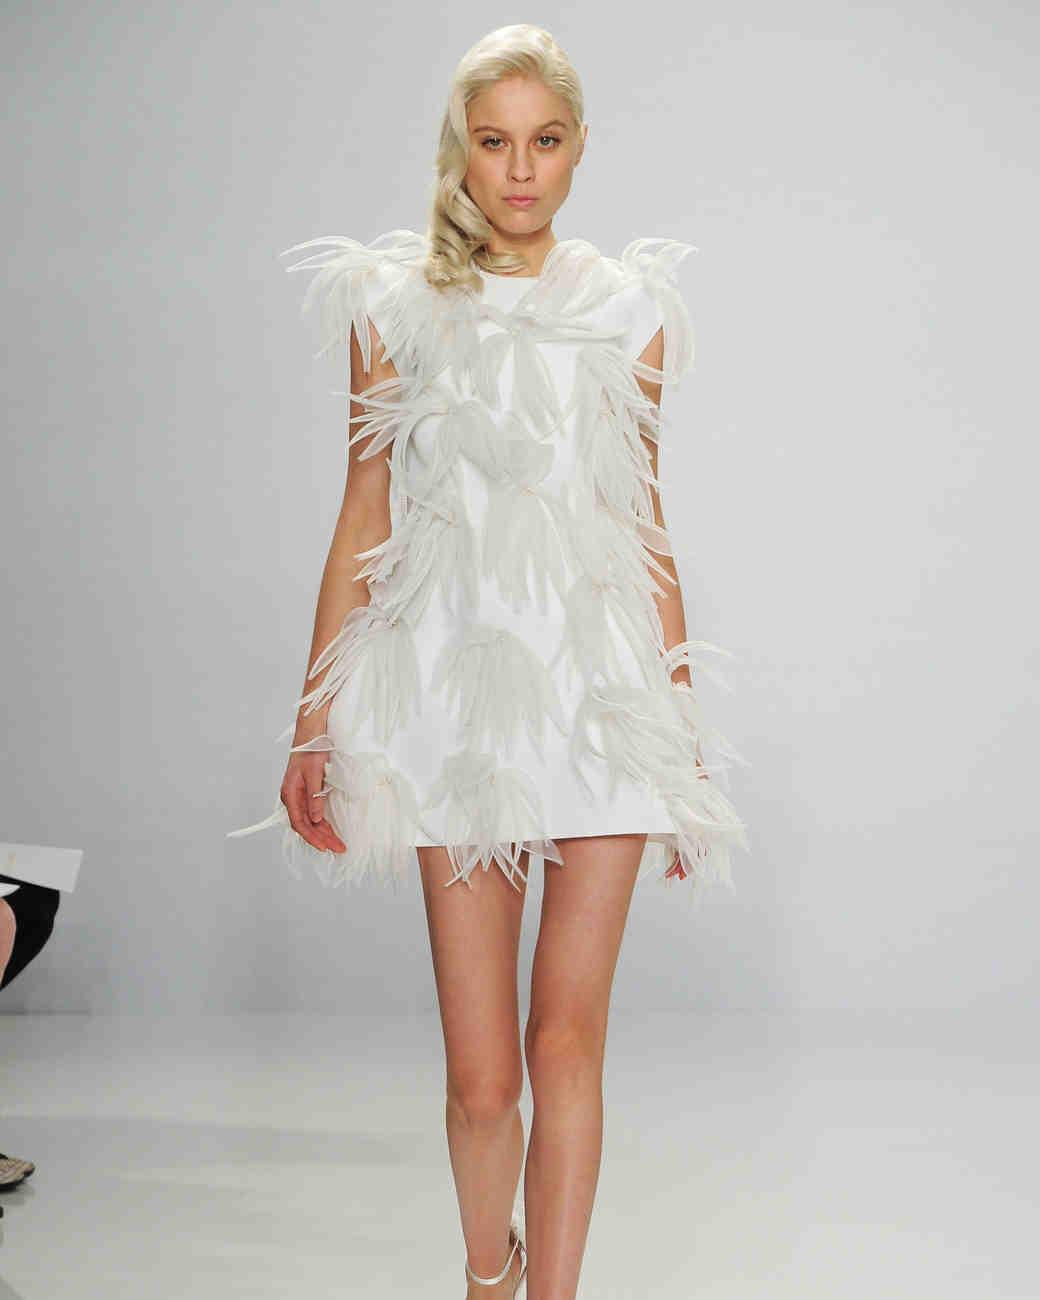 Christian Siriano For Kleinfeld Spring 2017 Wedding Dress